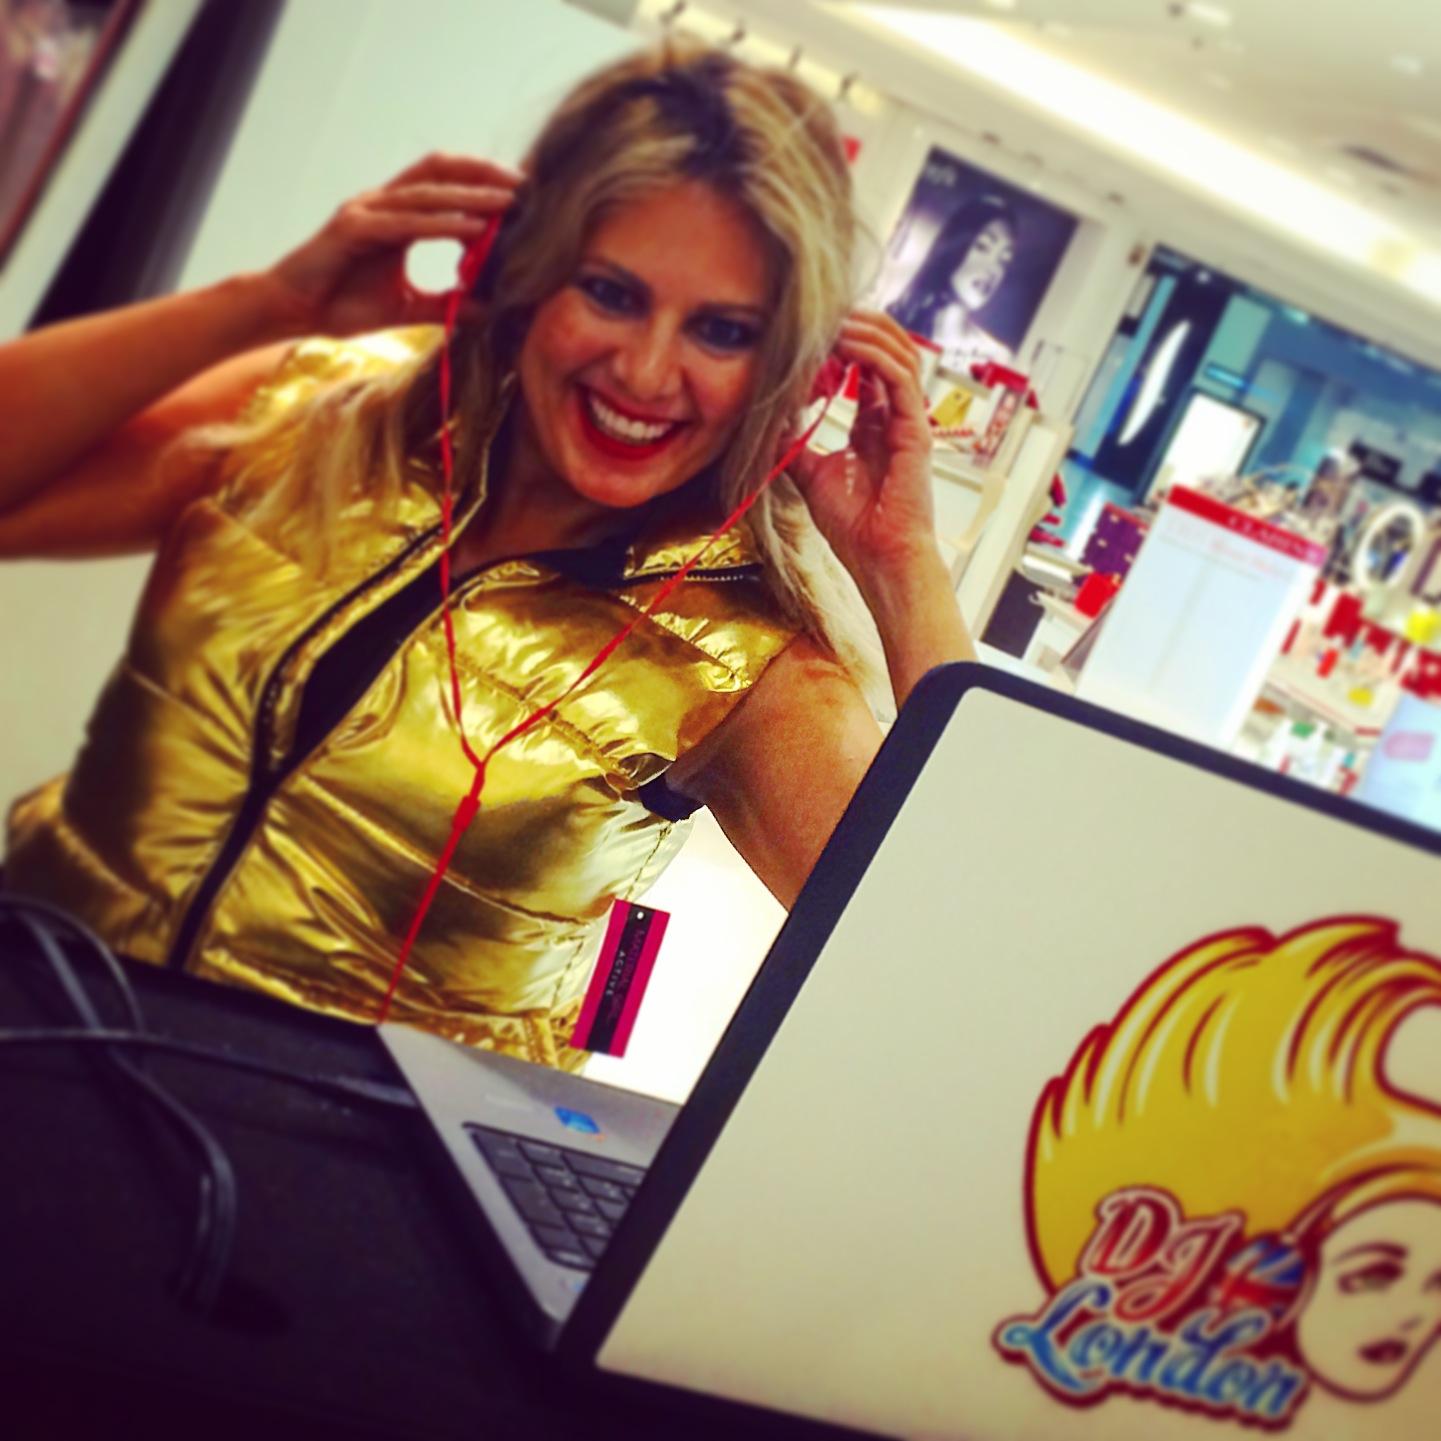 Macy's Gold DJ London